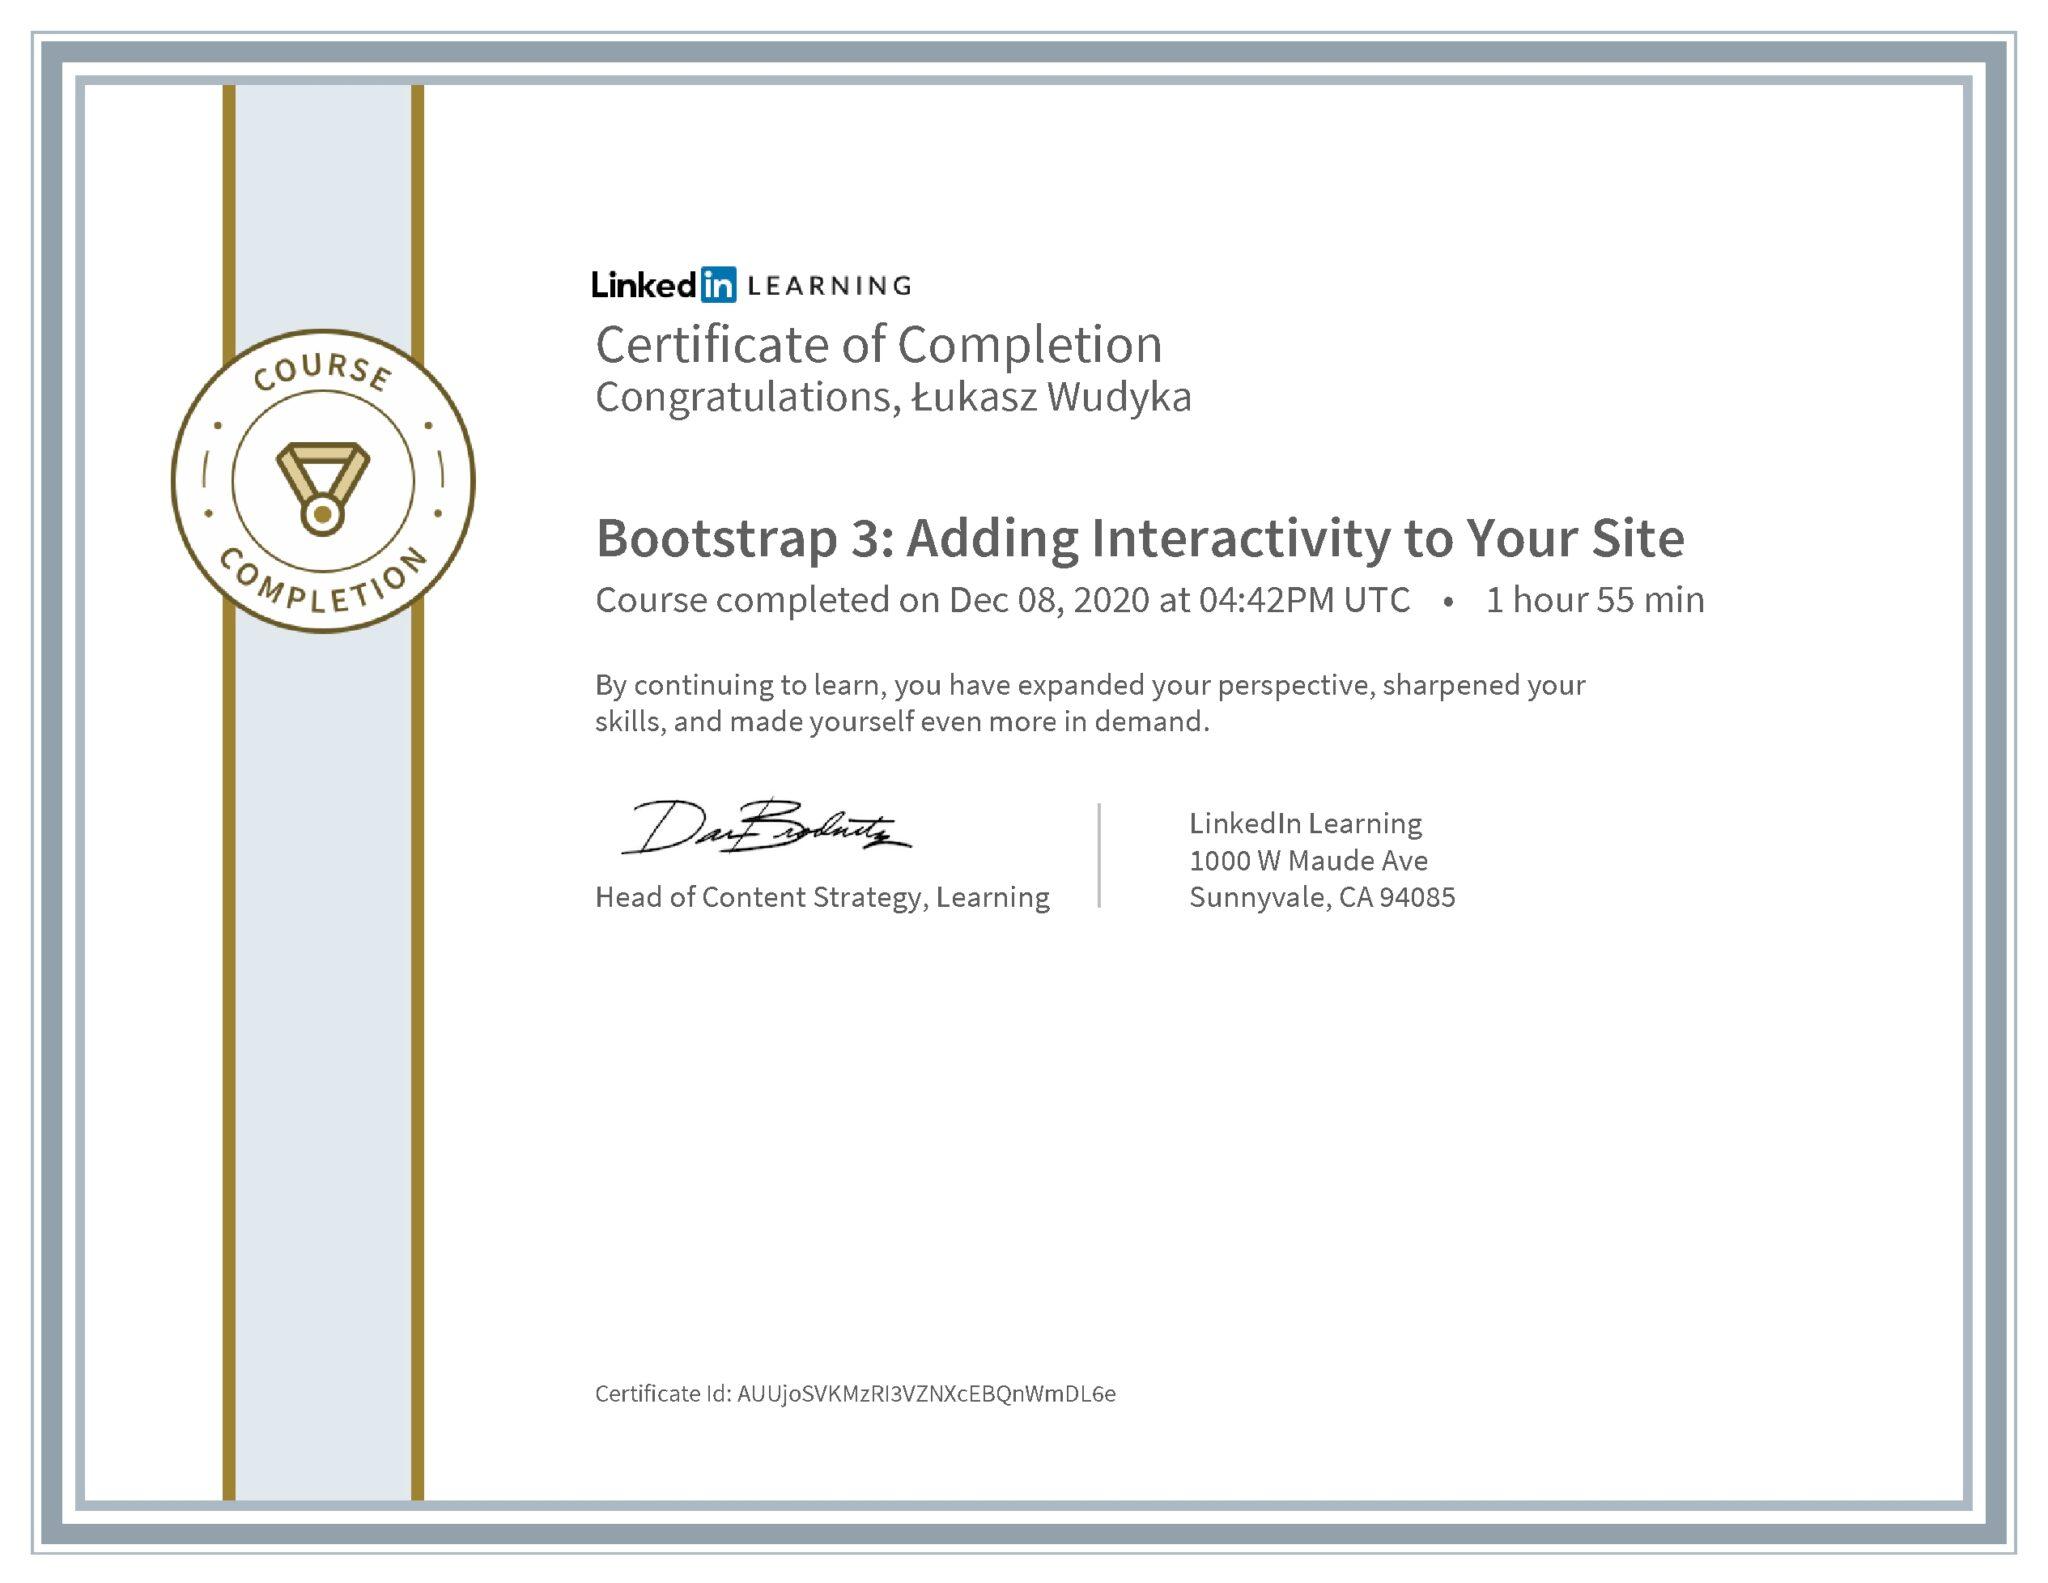 Łukasz Wudyka certyfikat LinkedIn Bootstrap 3: Adding Interactivity to Your Site